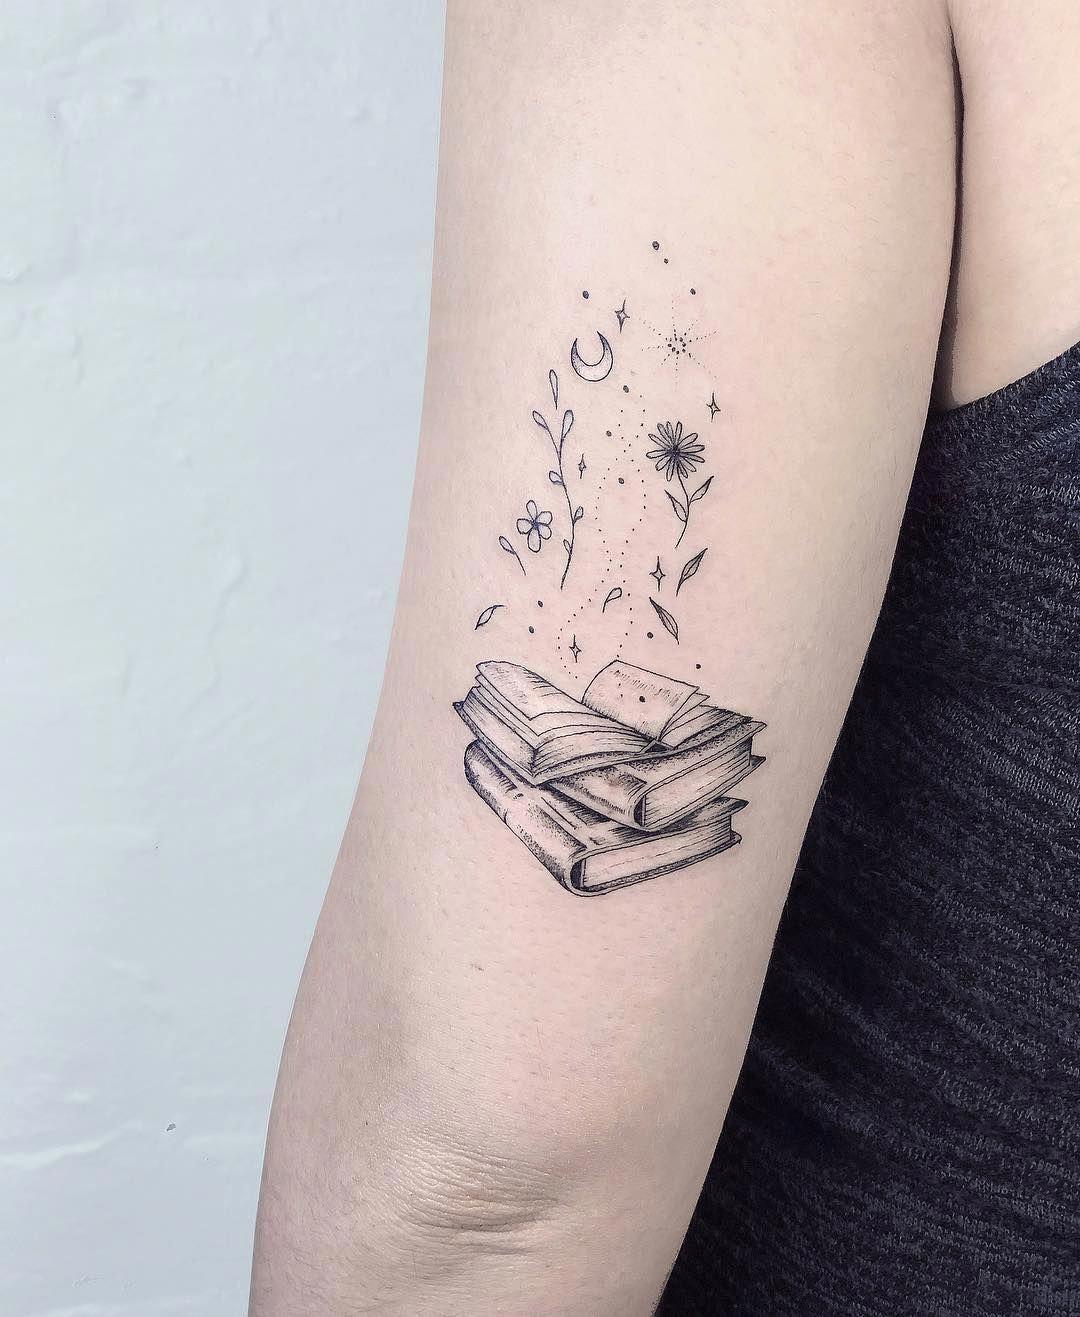 Magical Books For Anastasia Nicole Thank You So Much Again Girls Greattattoosforgirls Bookish Tattoos Tattoos For Lovers Tattoos